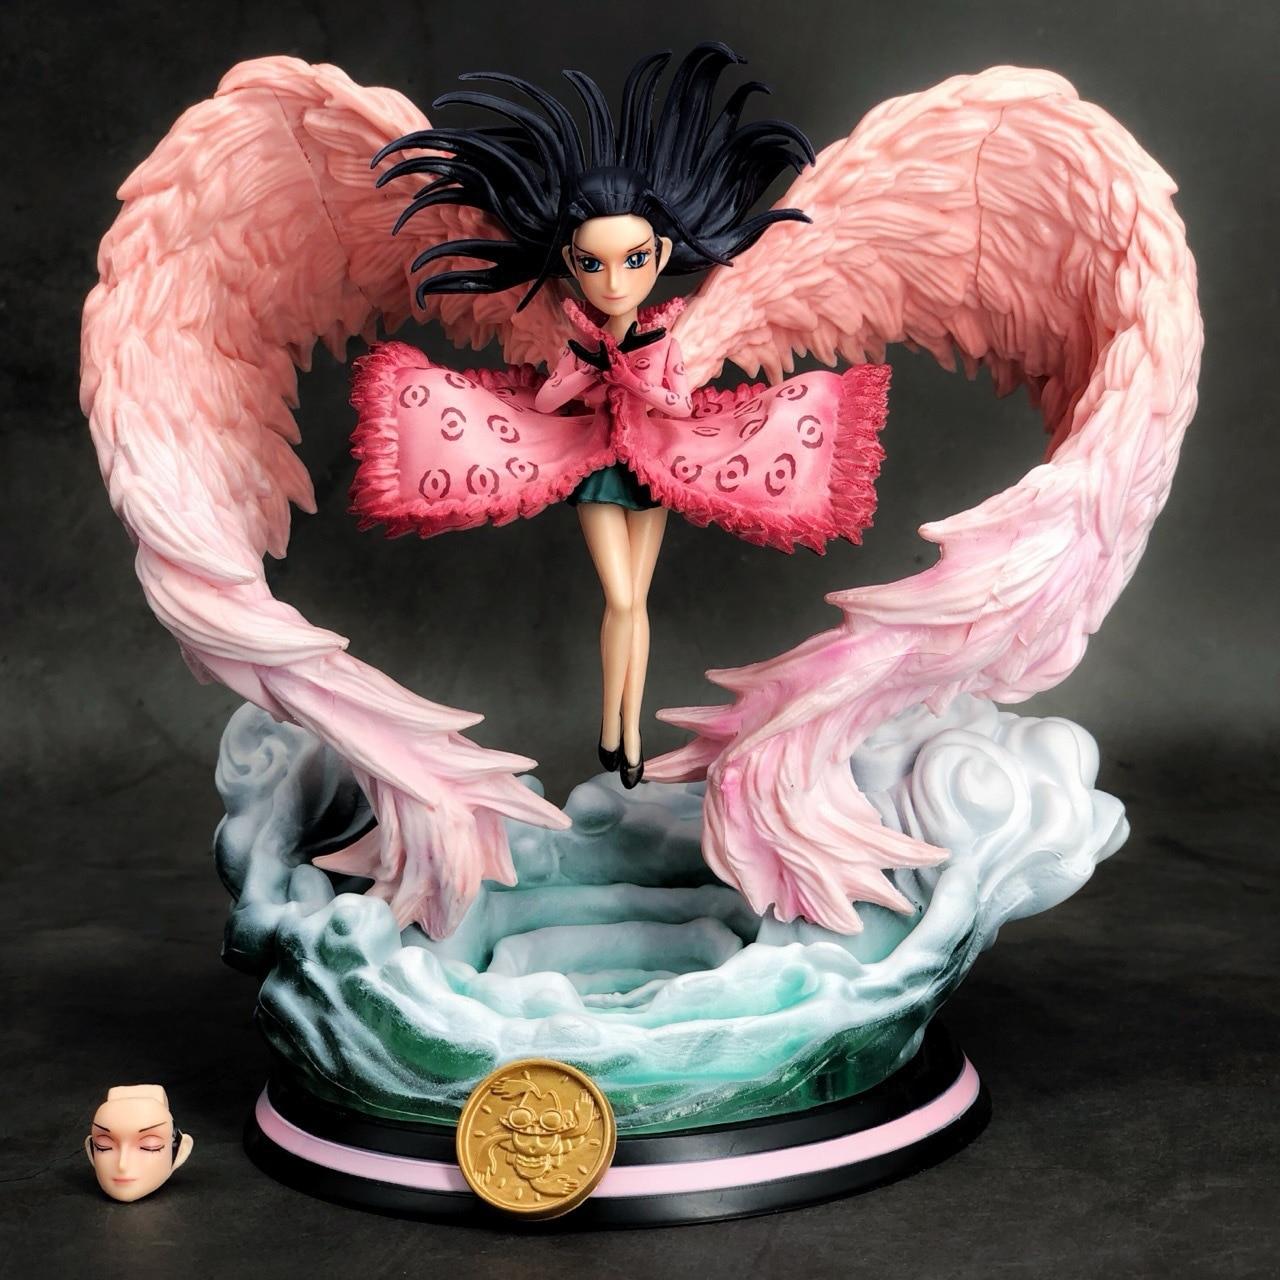 15 Cm Bandai Film Z Figure One Piece Nico Robin Ca Anime & Manga